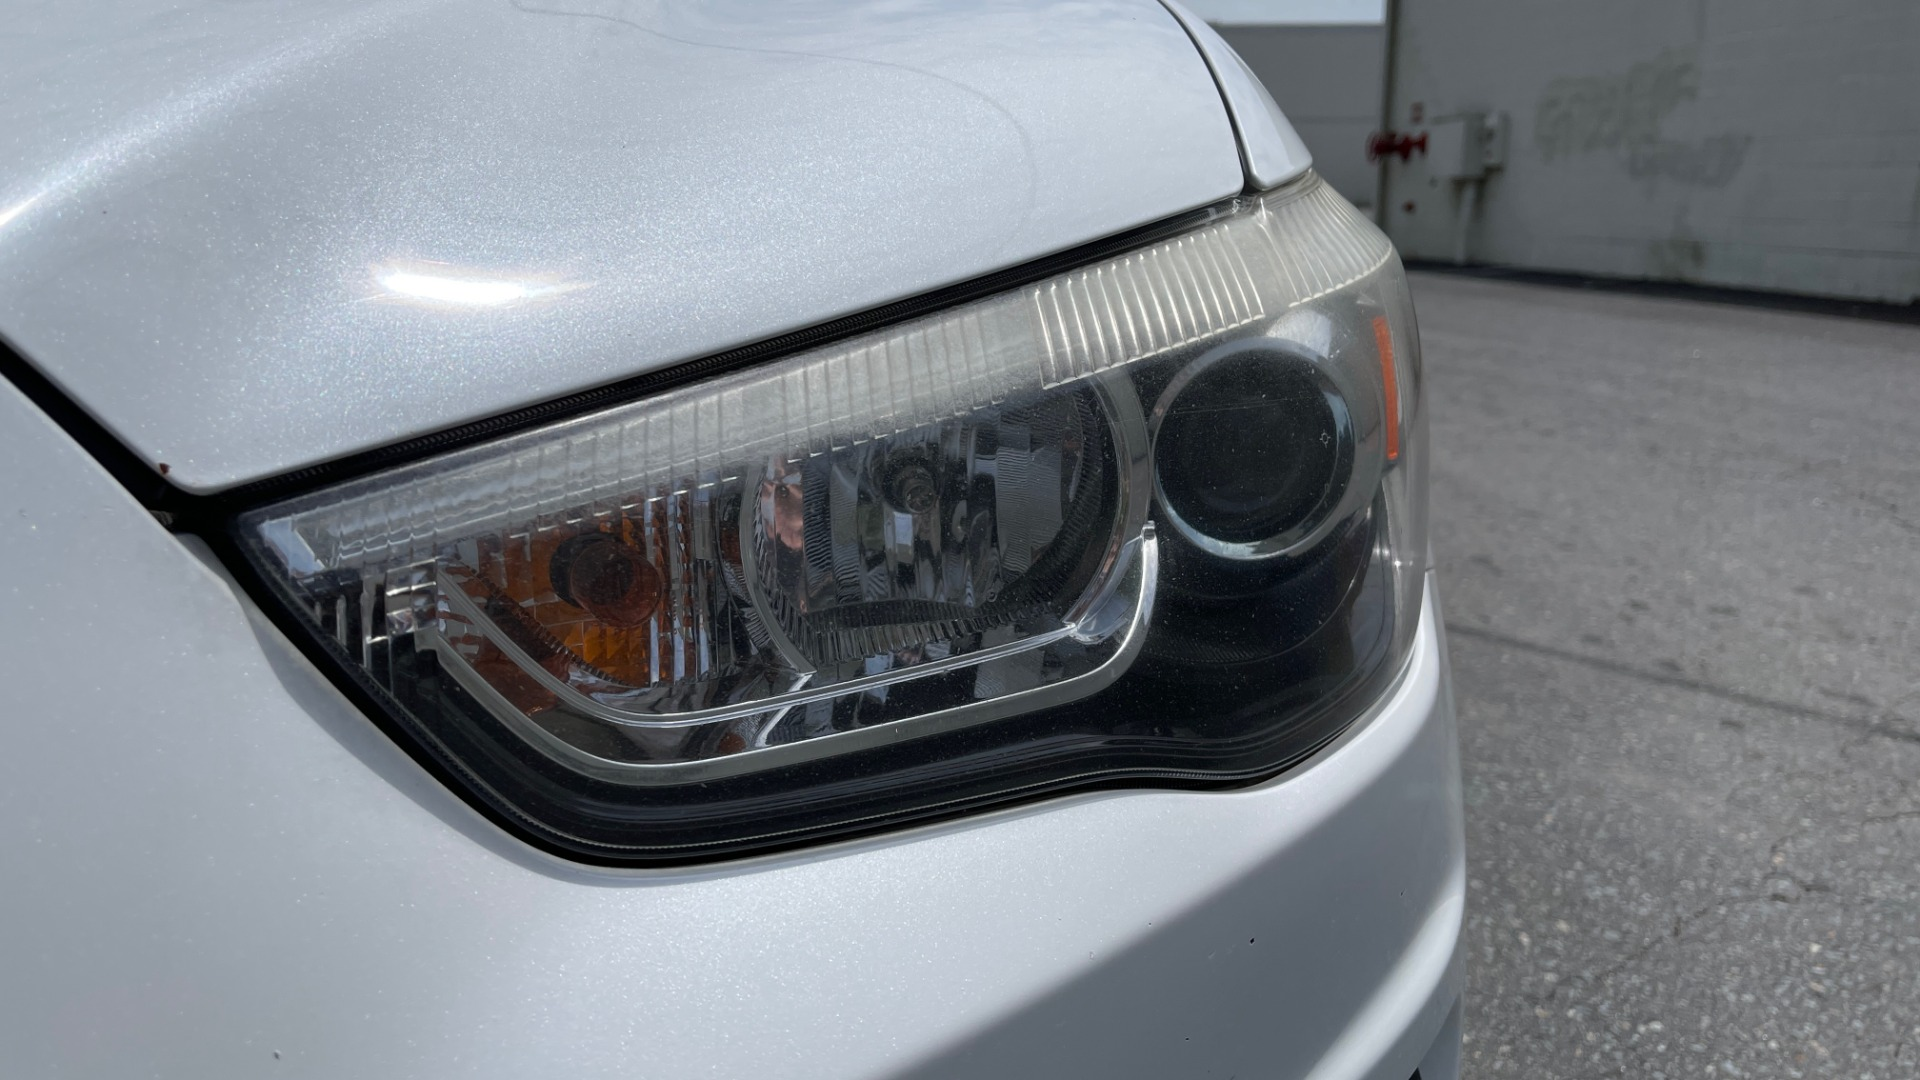 Used 2014 Mitsubishi OUTLANDER SPORT ES 2WD / 2.0L / CVT TRANS / 18IN WHEELS / 31MPG for sale $8,495 at Formula Imports in Charlotte NC 28227 14